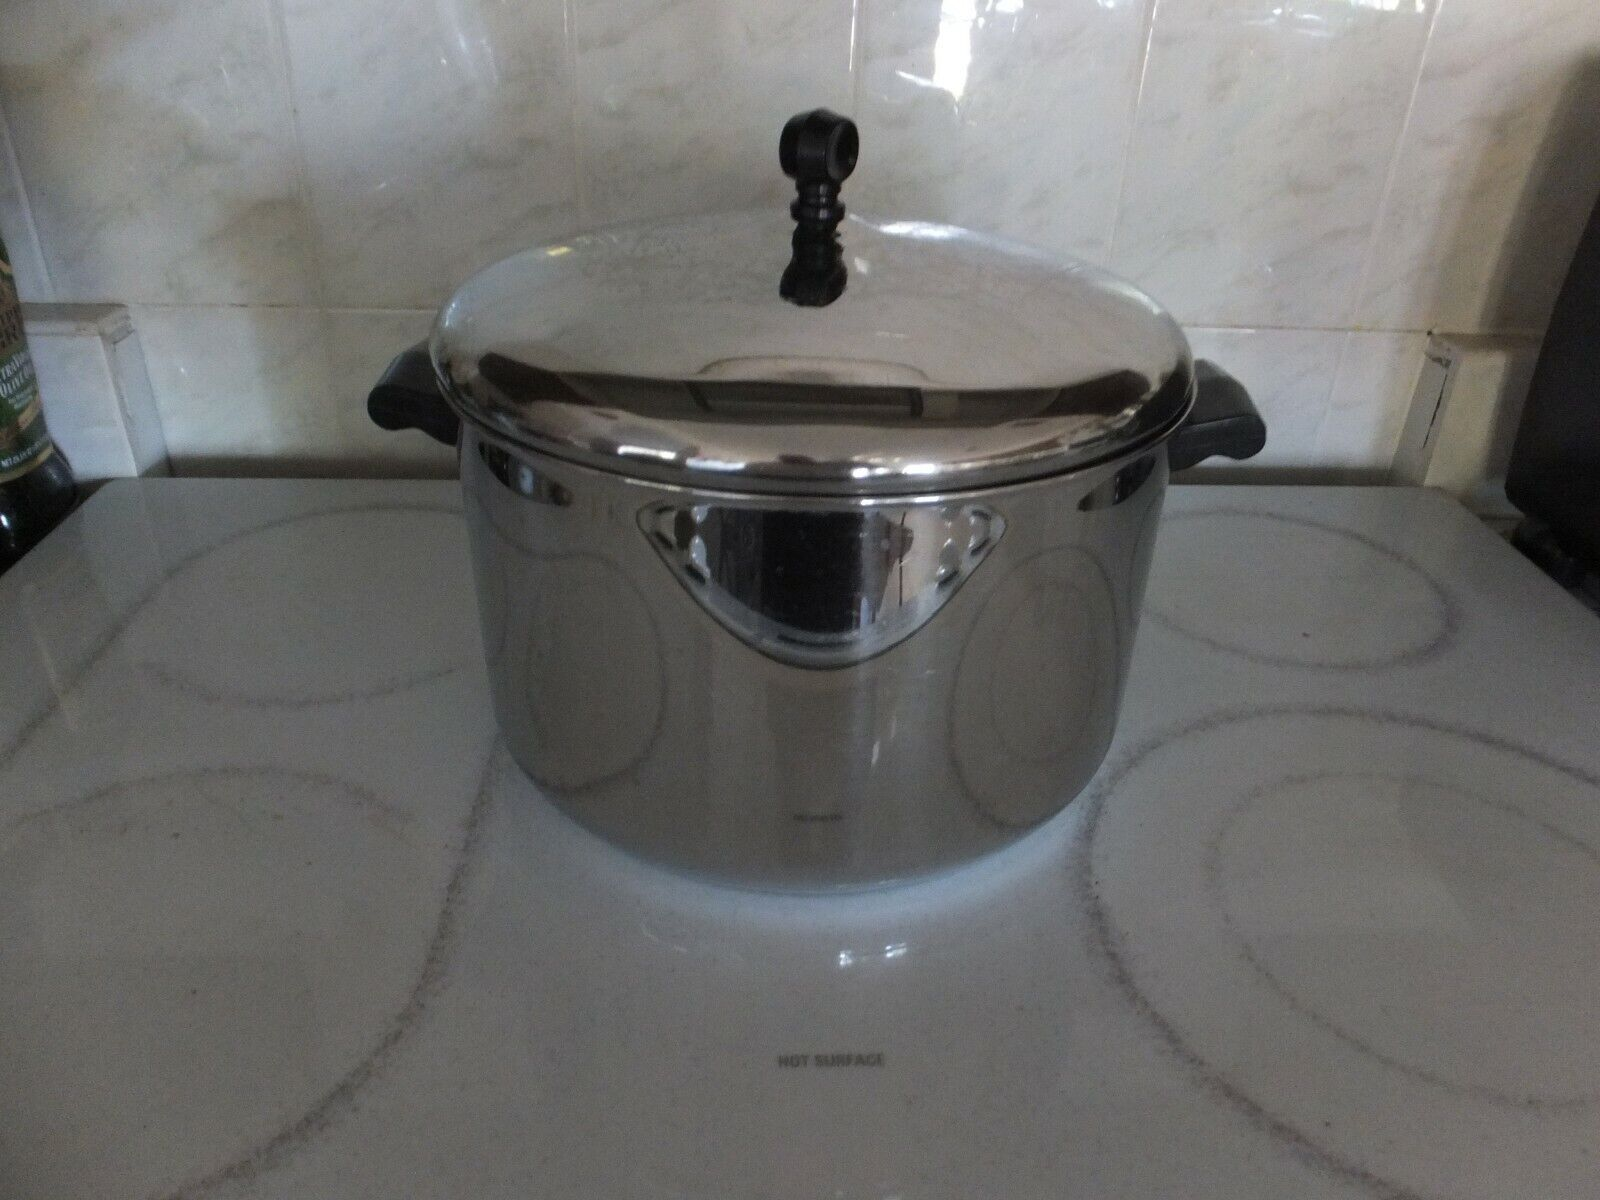 FARBERWARE 8qt Stock Pot Dutch oven Aluminum Clad Stainless